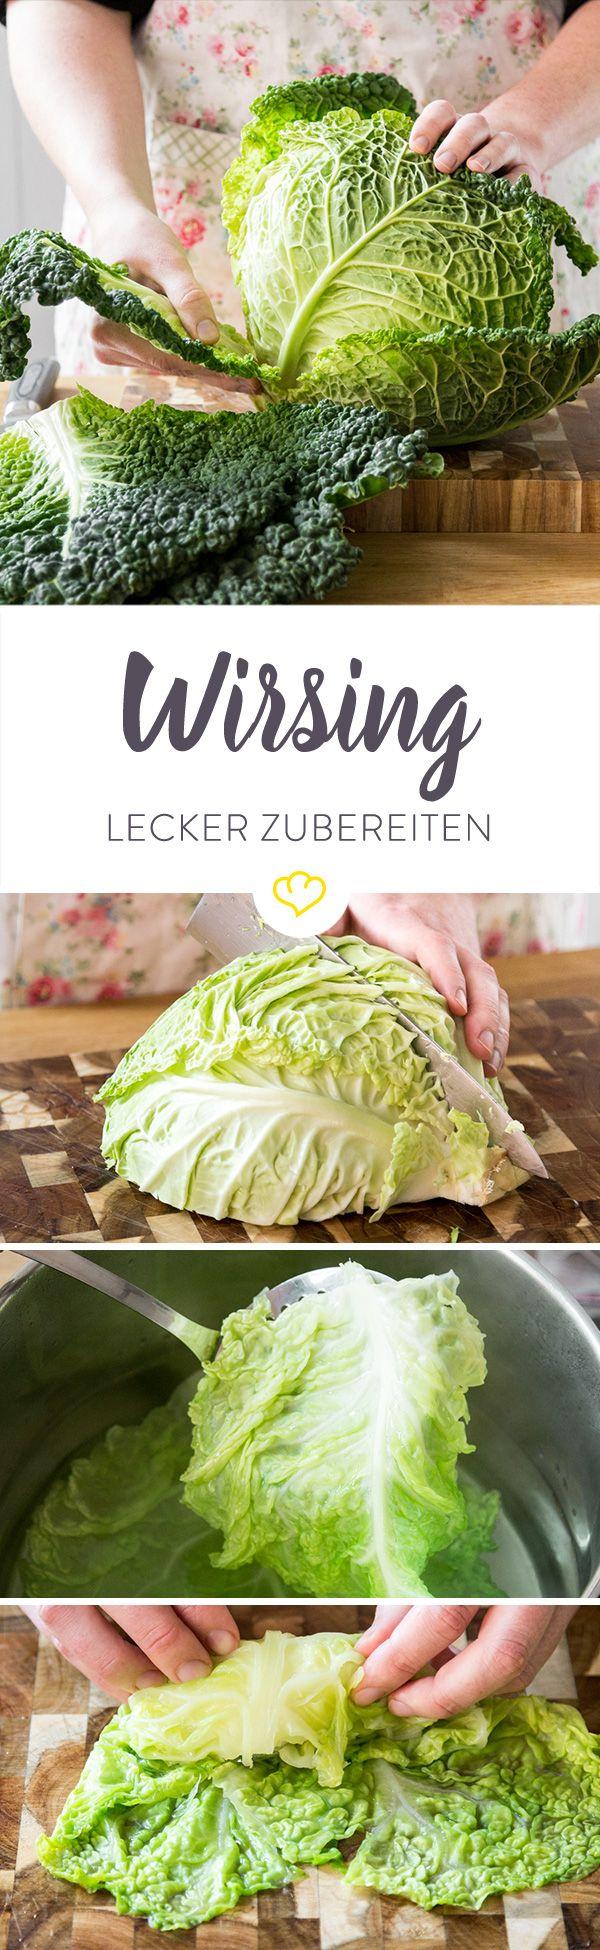 38 best Gemüse - Wissen & Rezepte images on Pinterest | Healthy ...